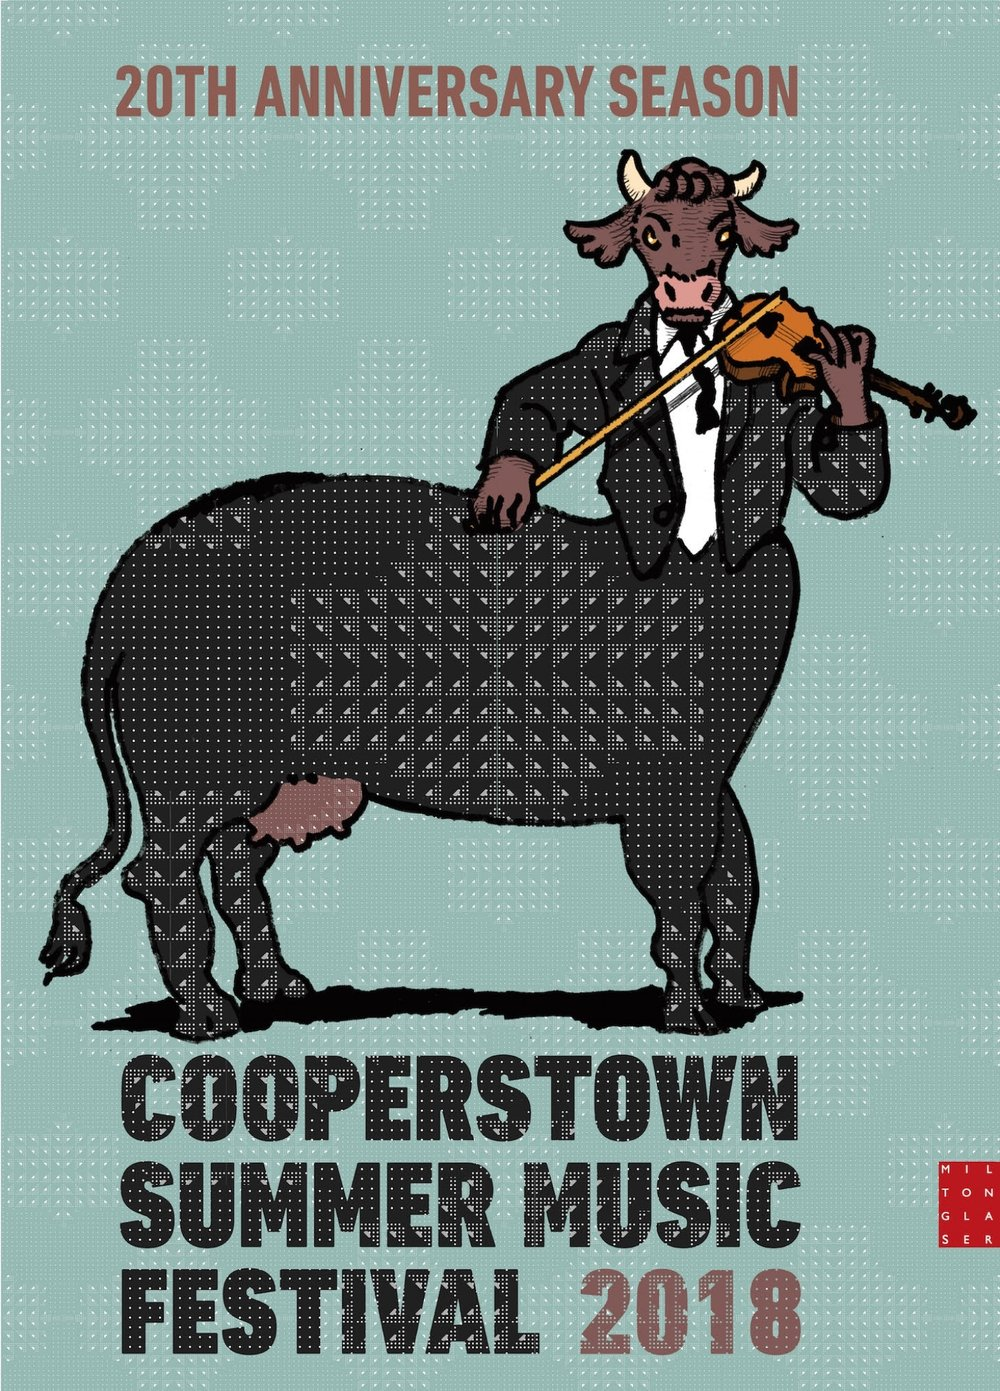 Cooperstown+2018+Season+Poster+february+7_R1.jpg